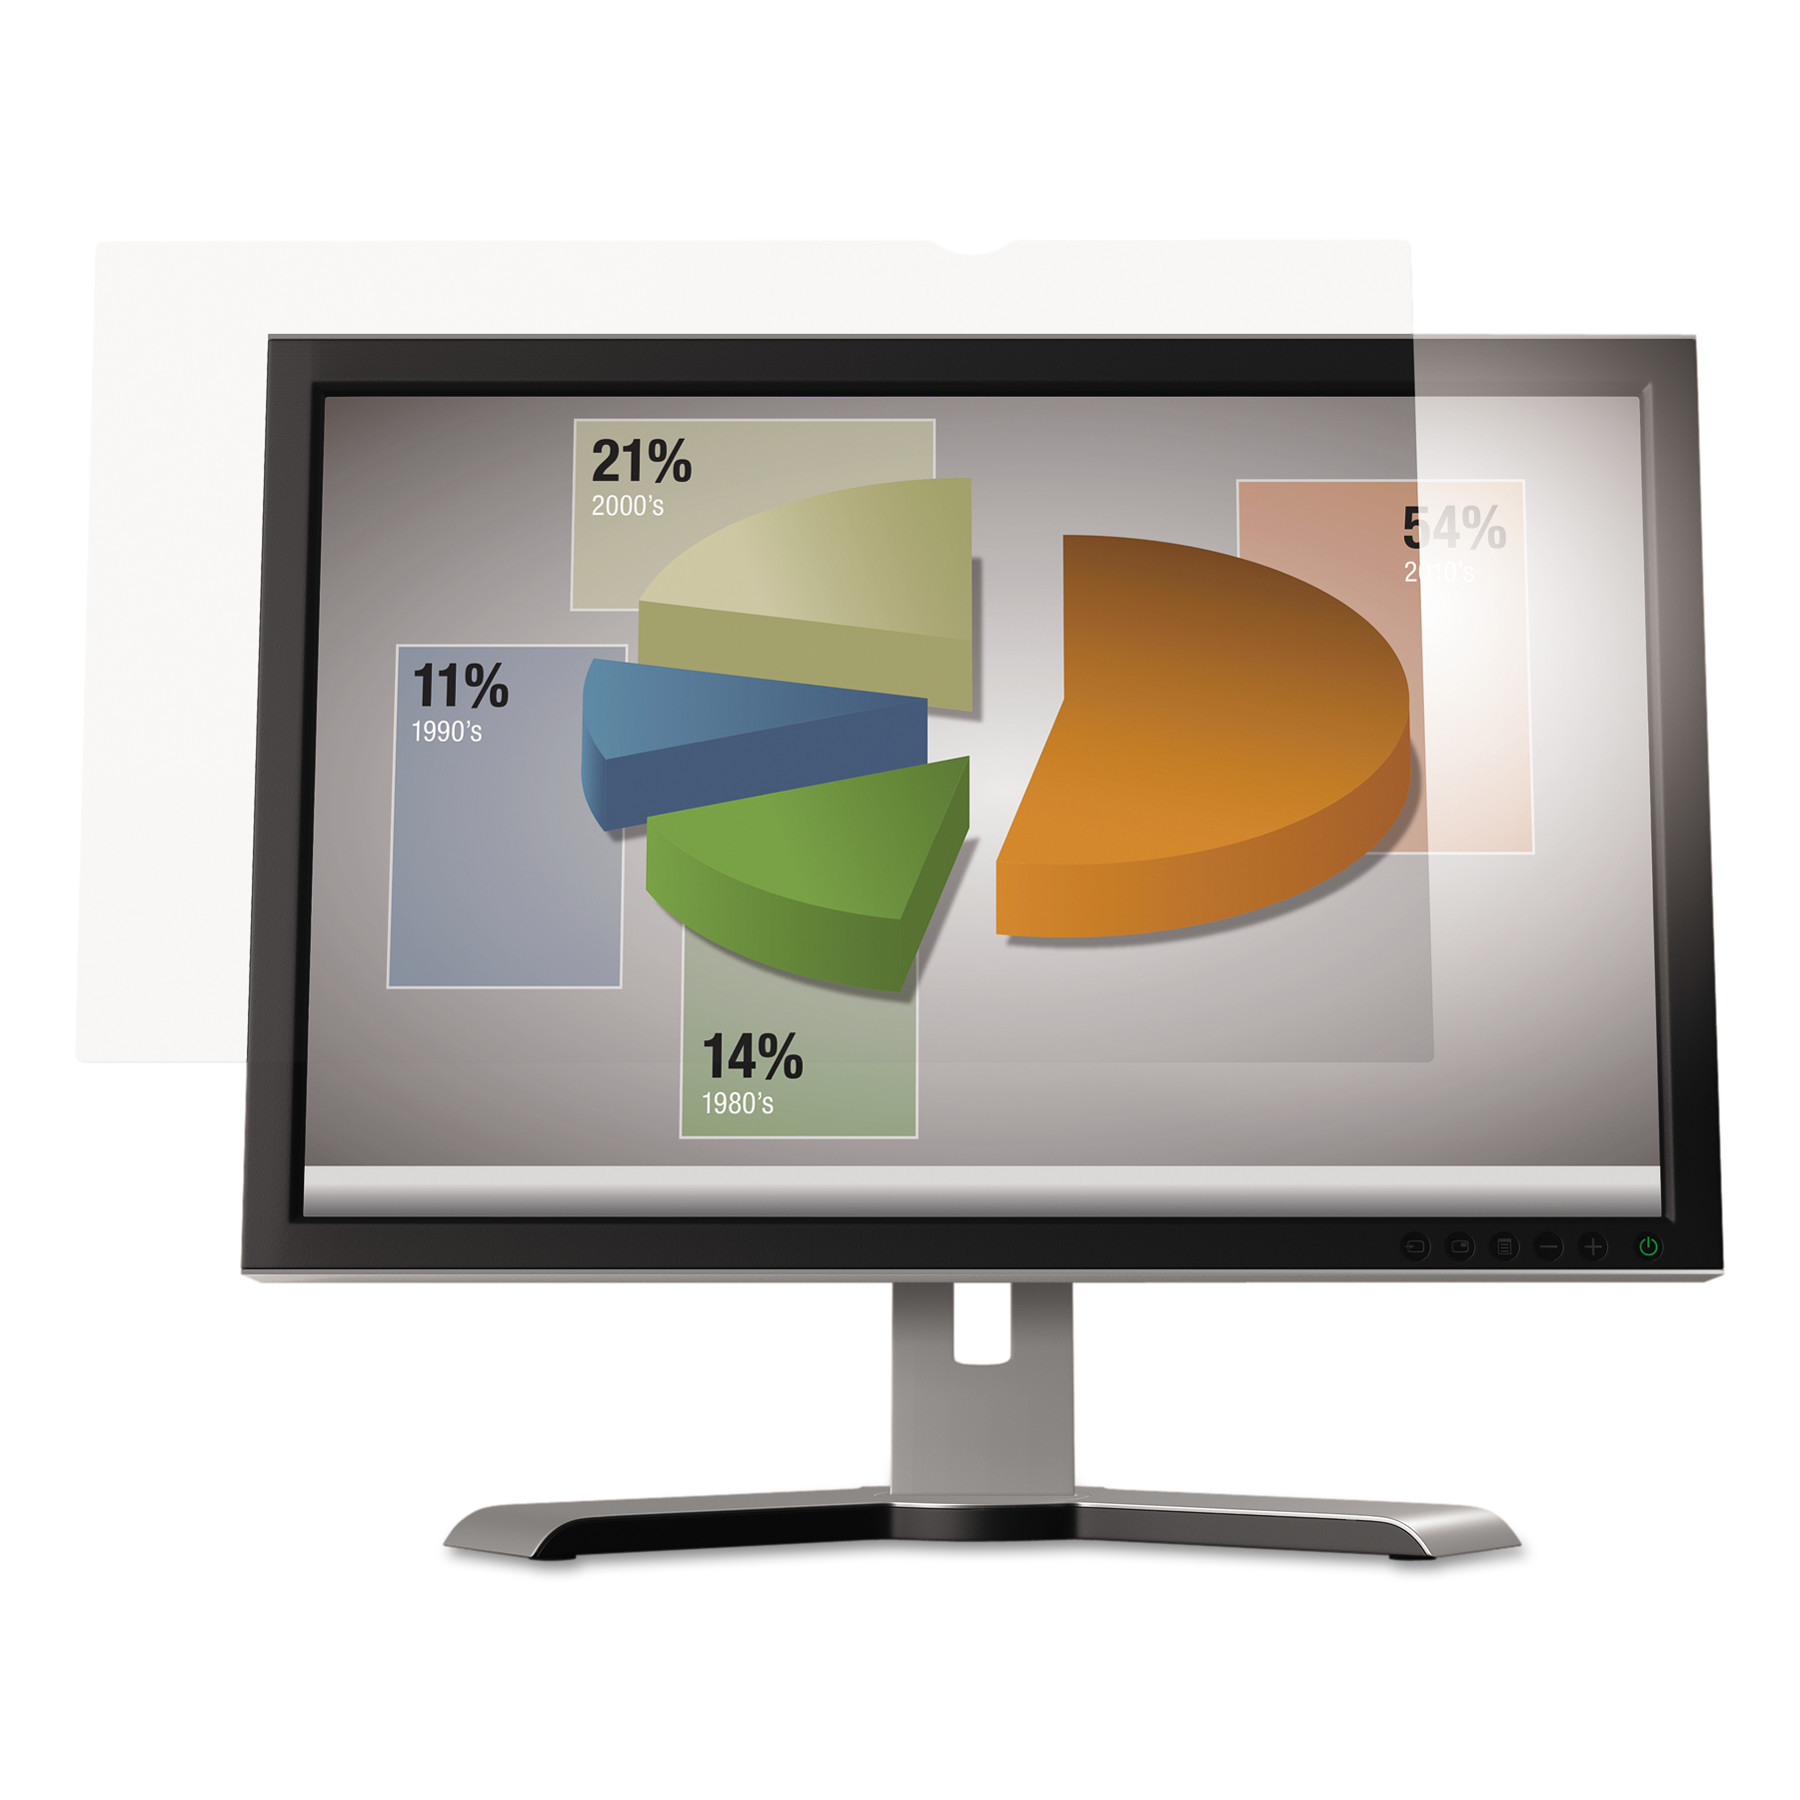 "3M Antiglare Flatscreen Frameless Monitor Filters for 24"" Widescreen LCD, 16:9"